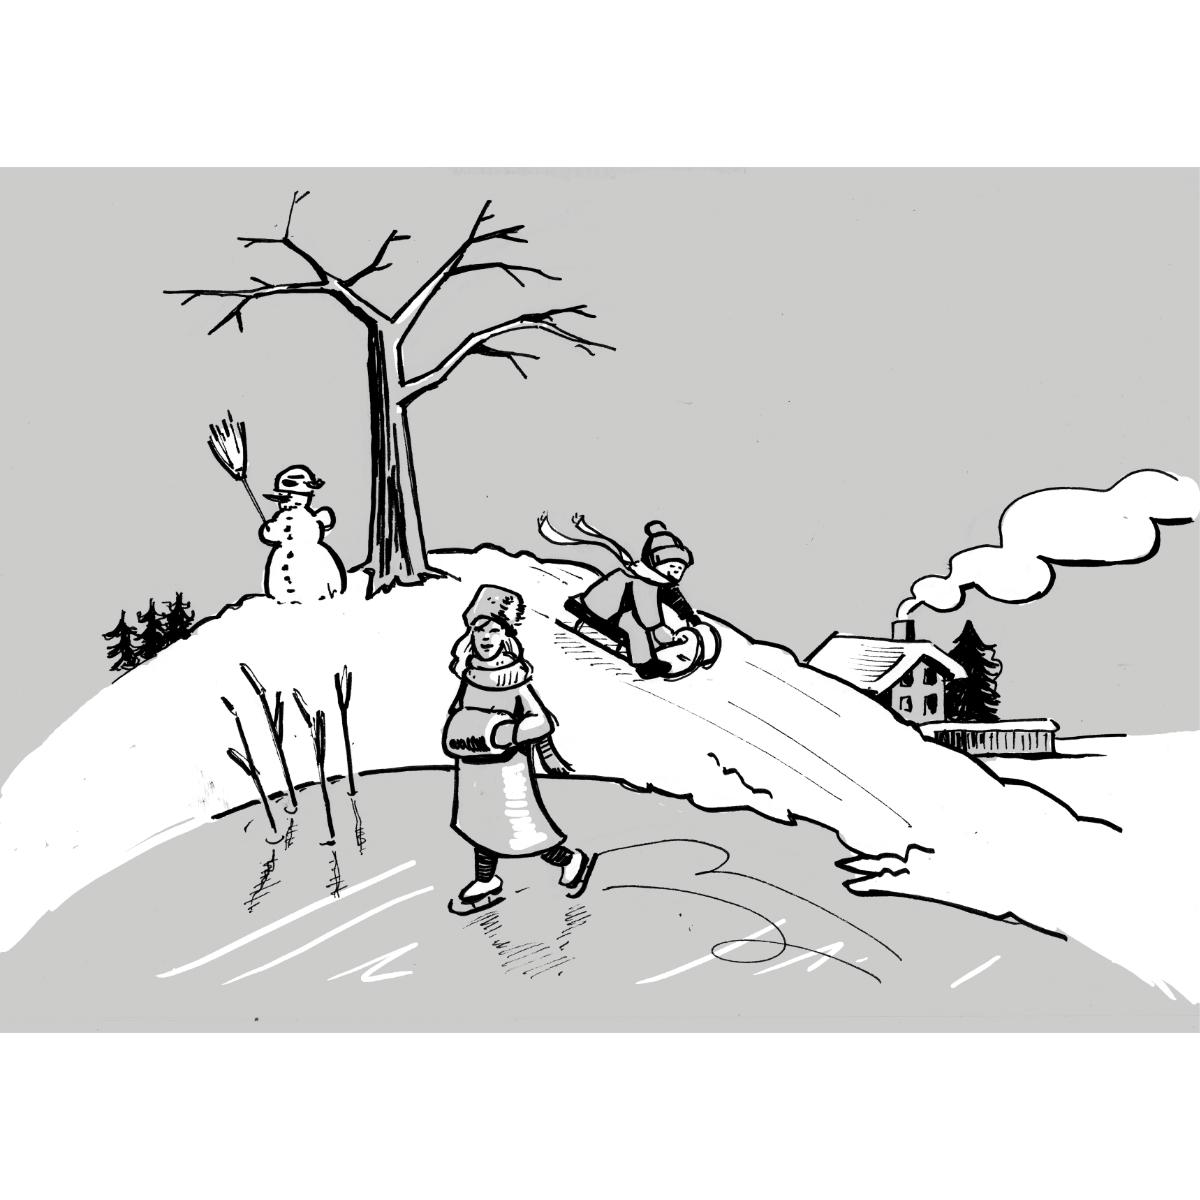 31-vignette-education-school-winter.jpg